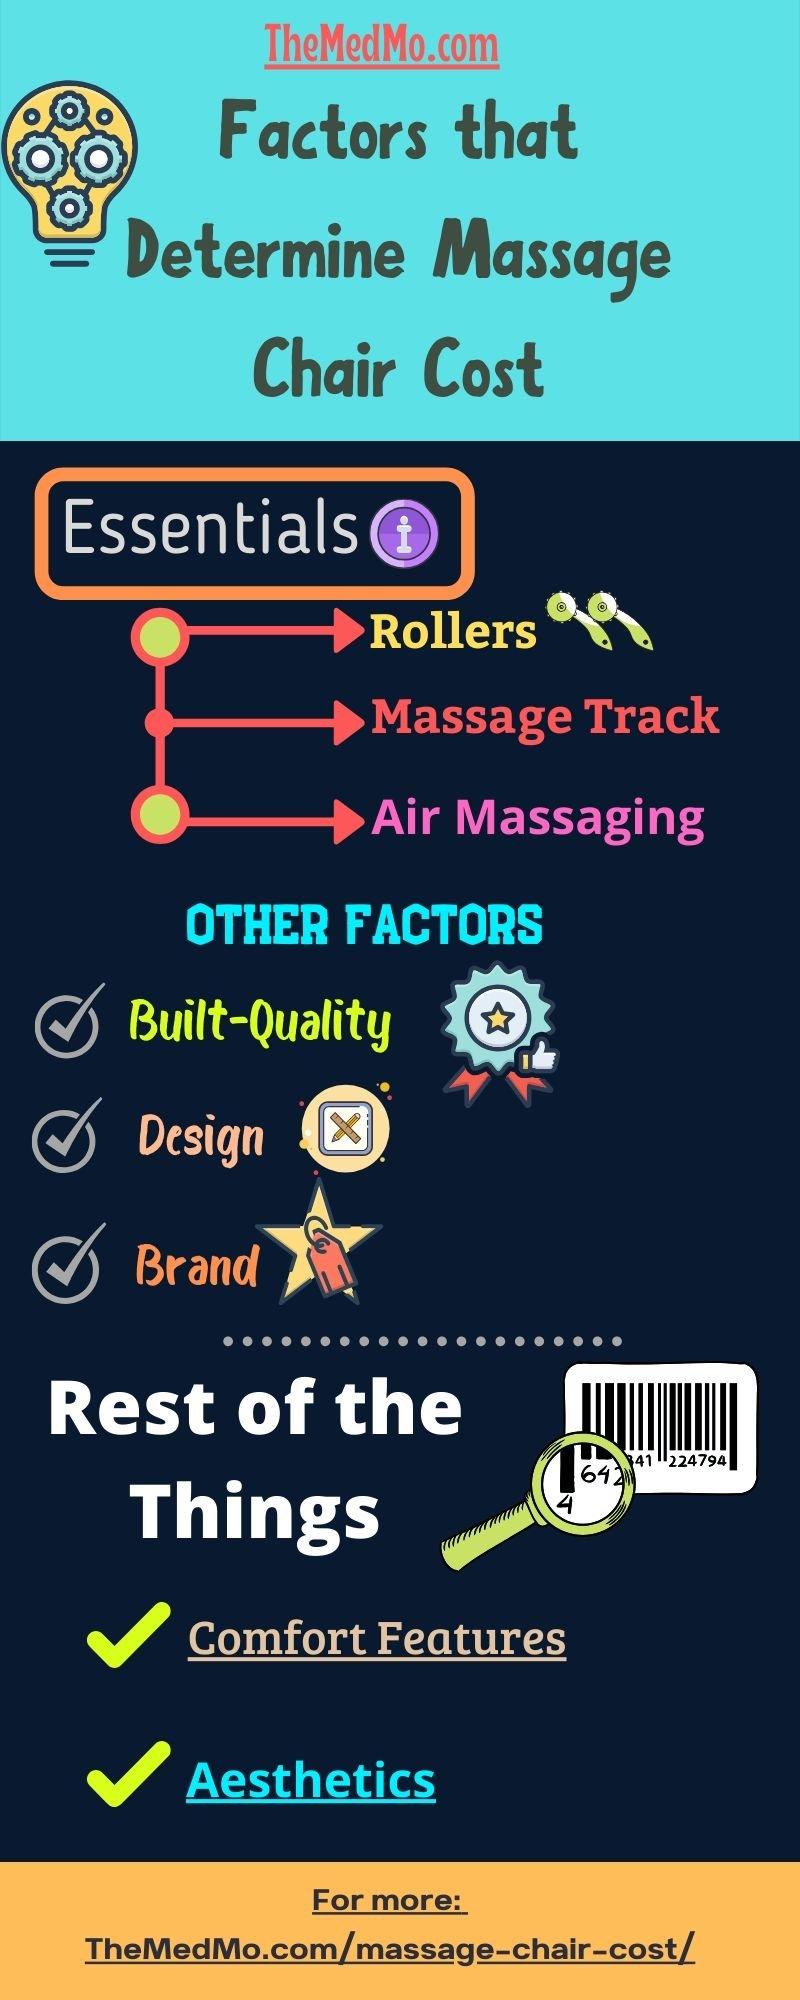 Factors that determine massage chair cost